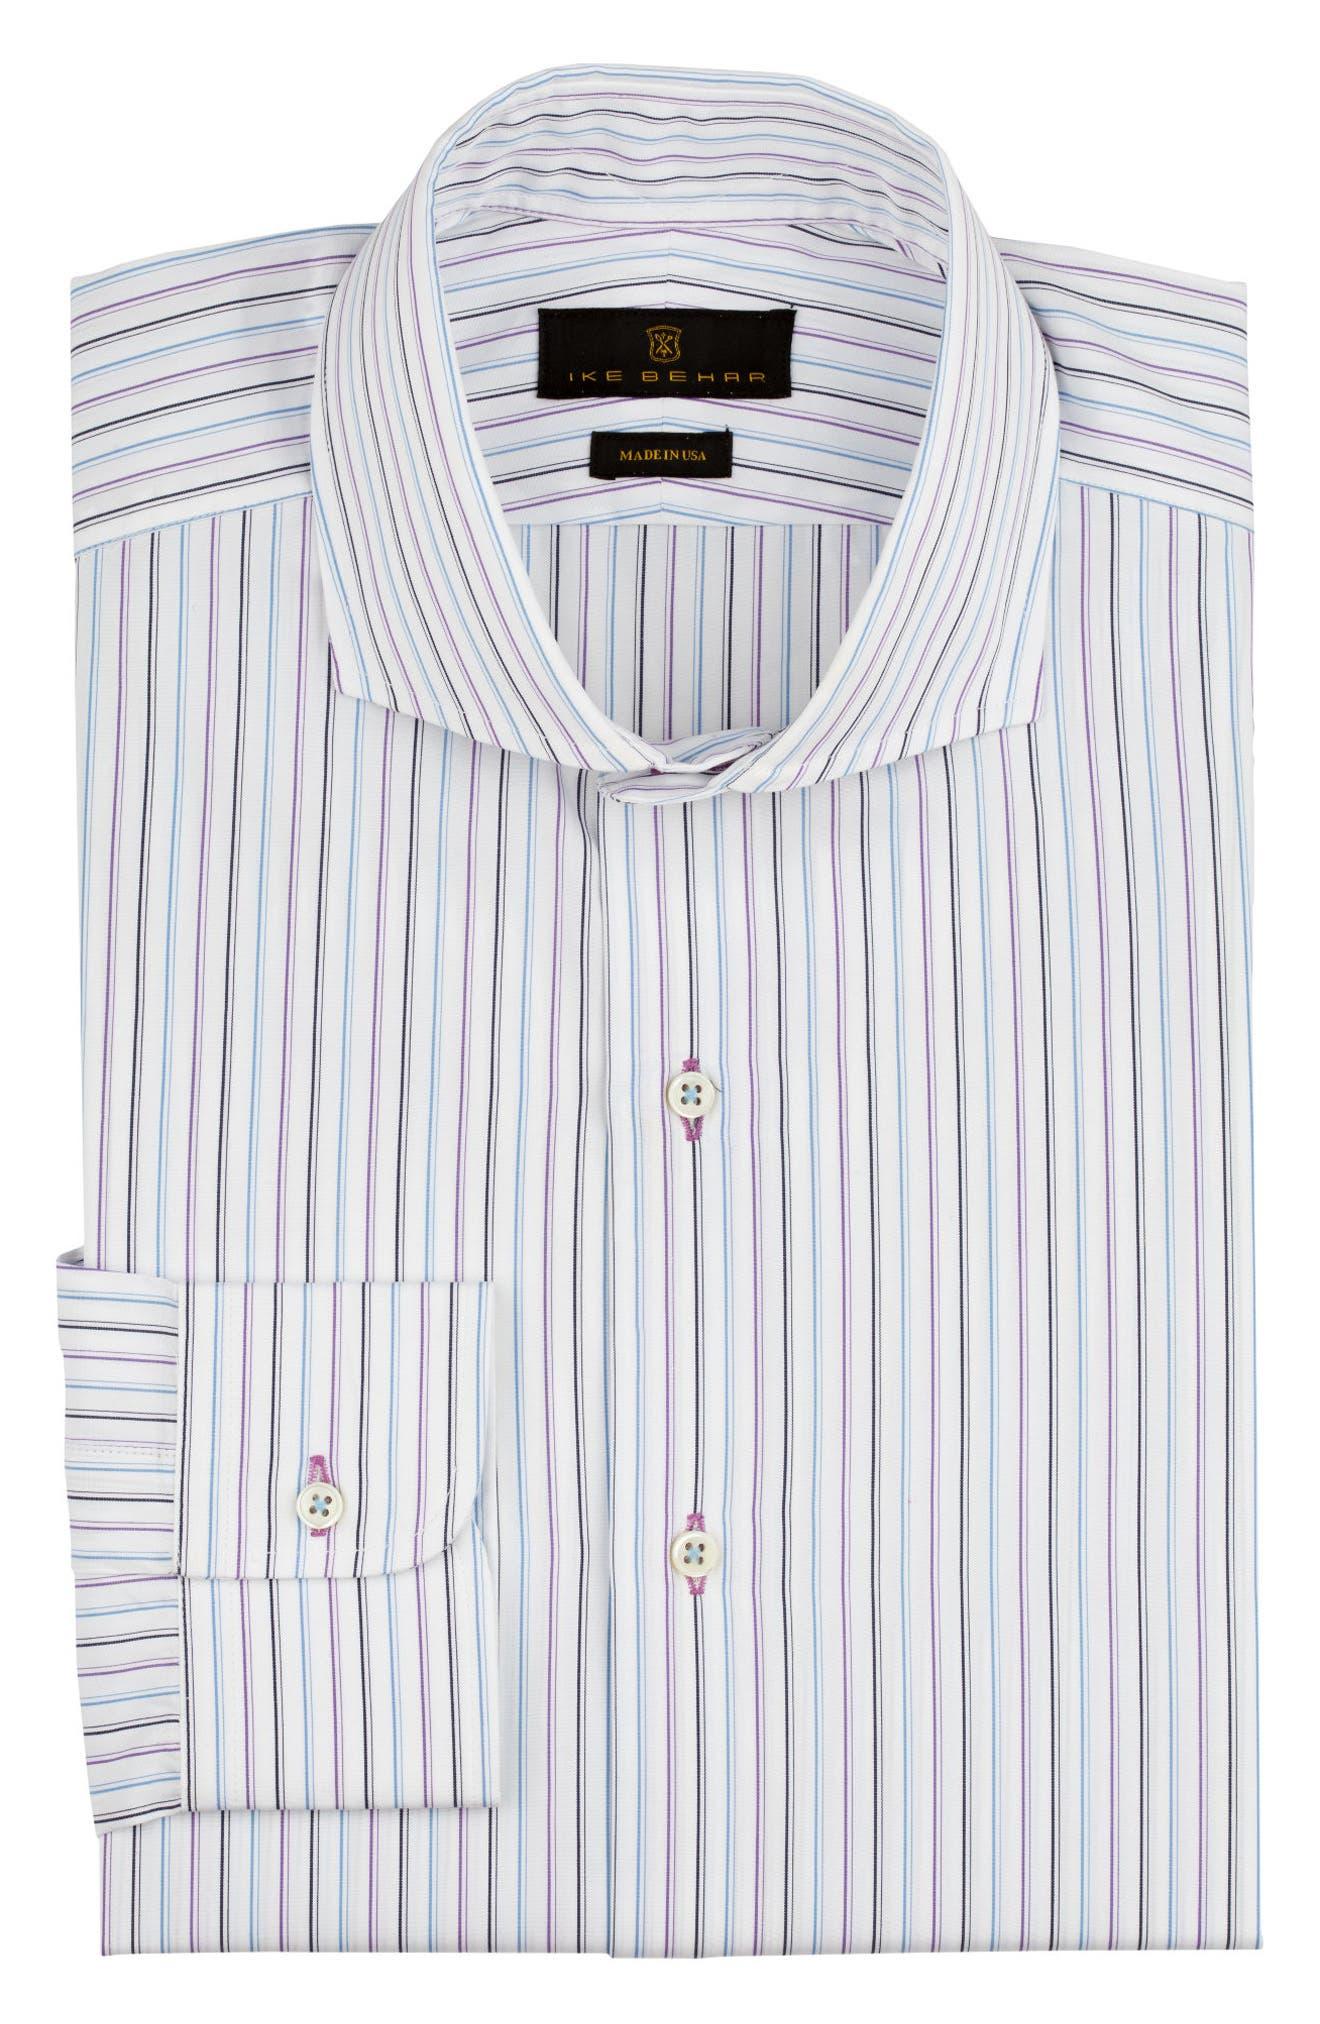 Regular Fit Stripe Dress Shirt,                             Alternate thumbnail 5, color,                             WHITE/ BLUE/ PURPLE